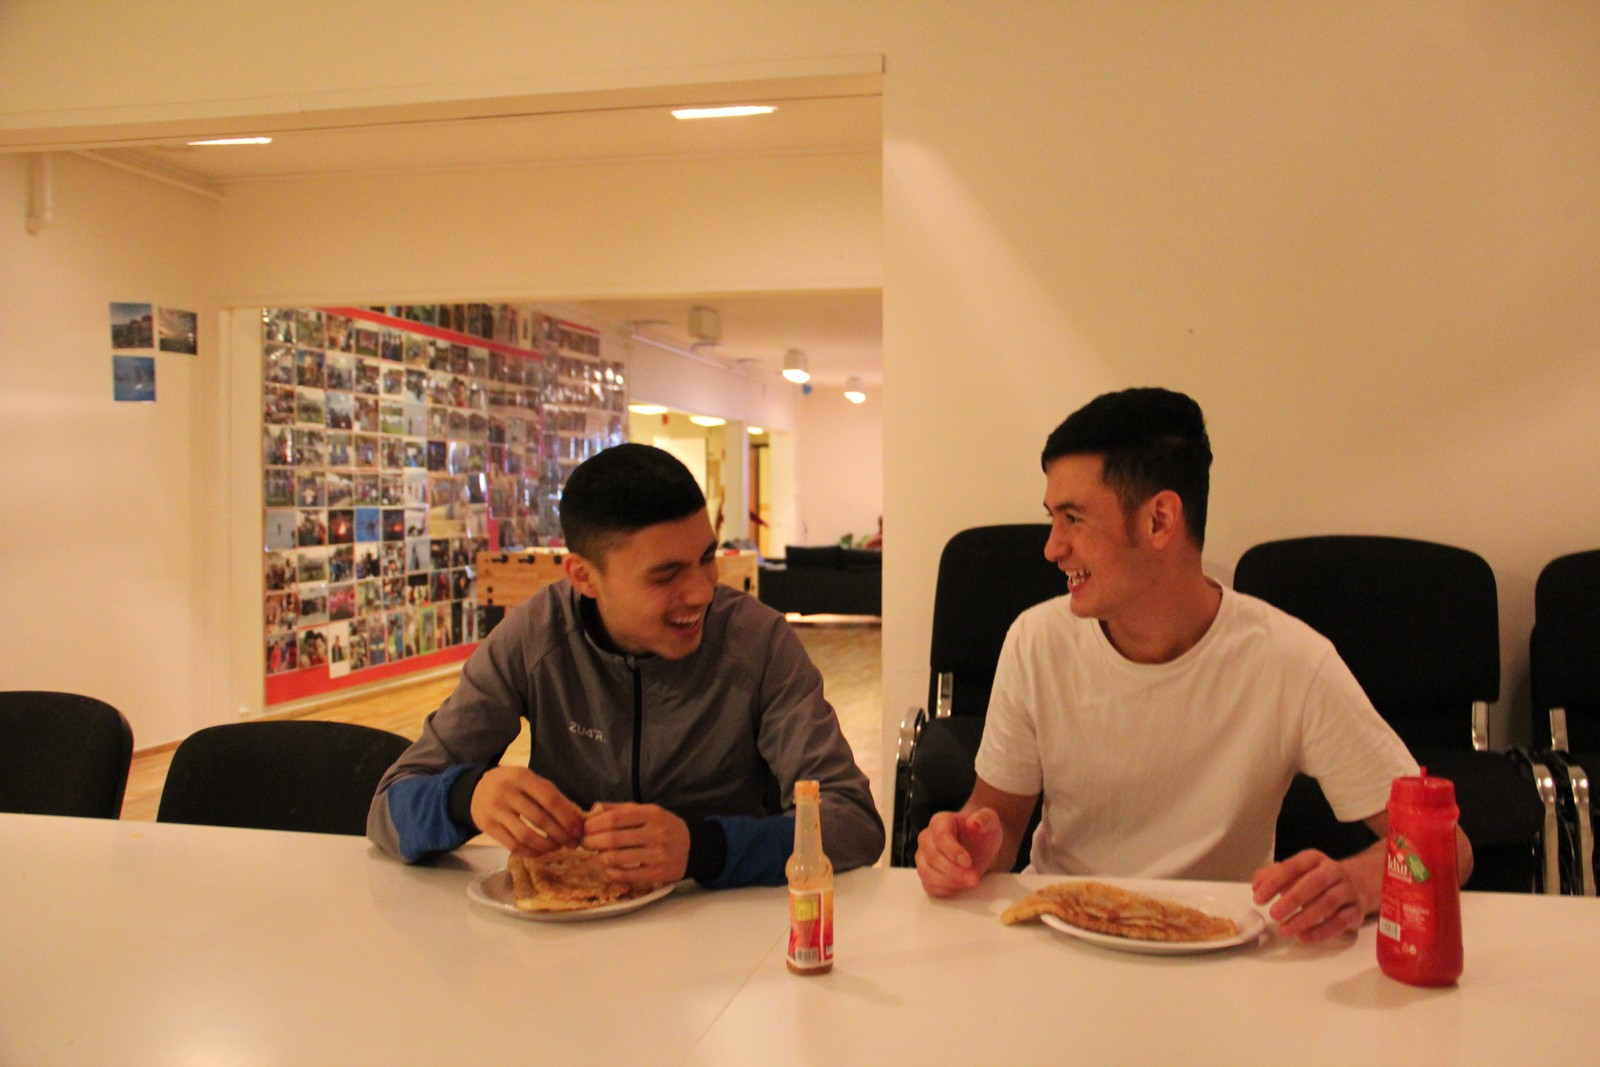 MIDDAG: De er venner, og koser seg her med pannestekt afghansk brød til middag, som de laget sammen med jentene på mottaket.